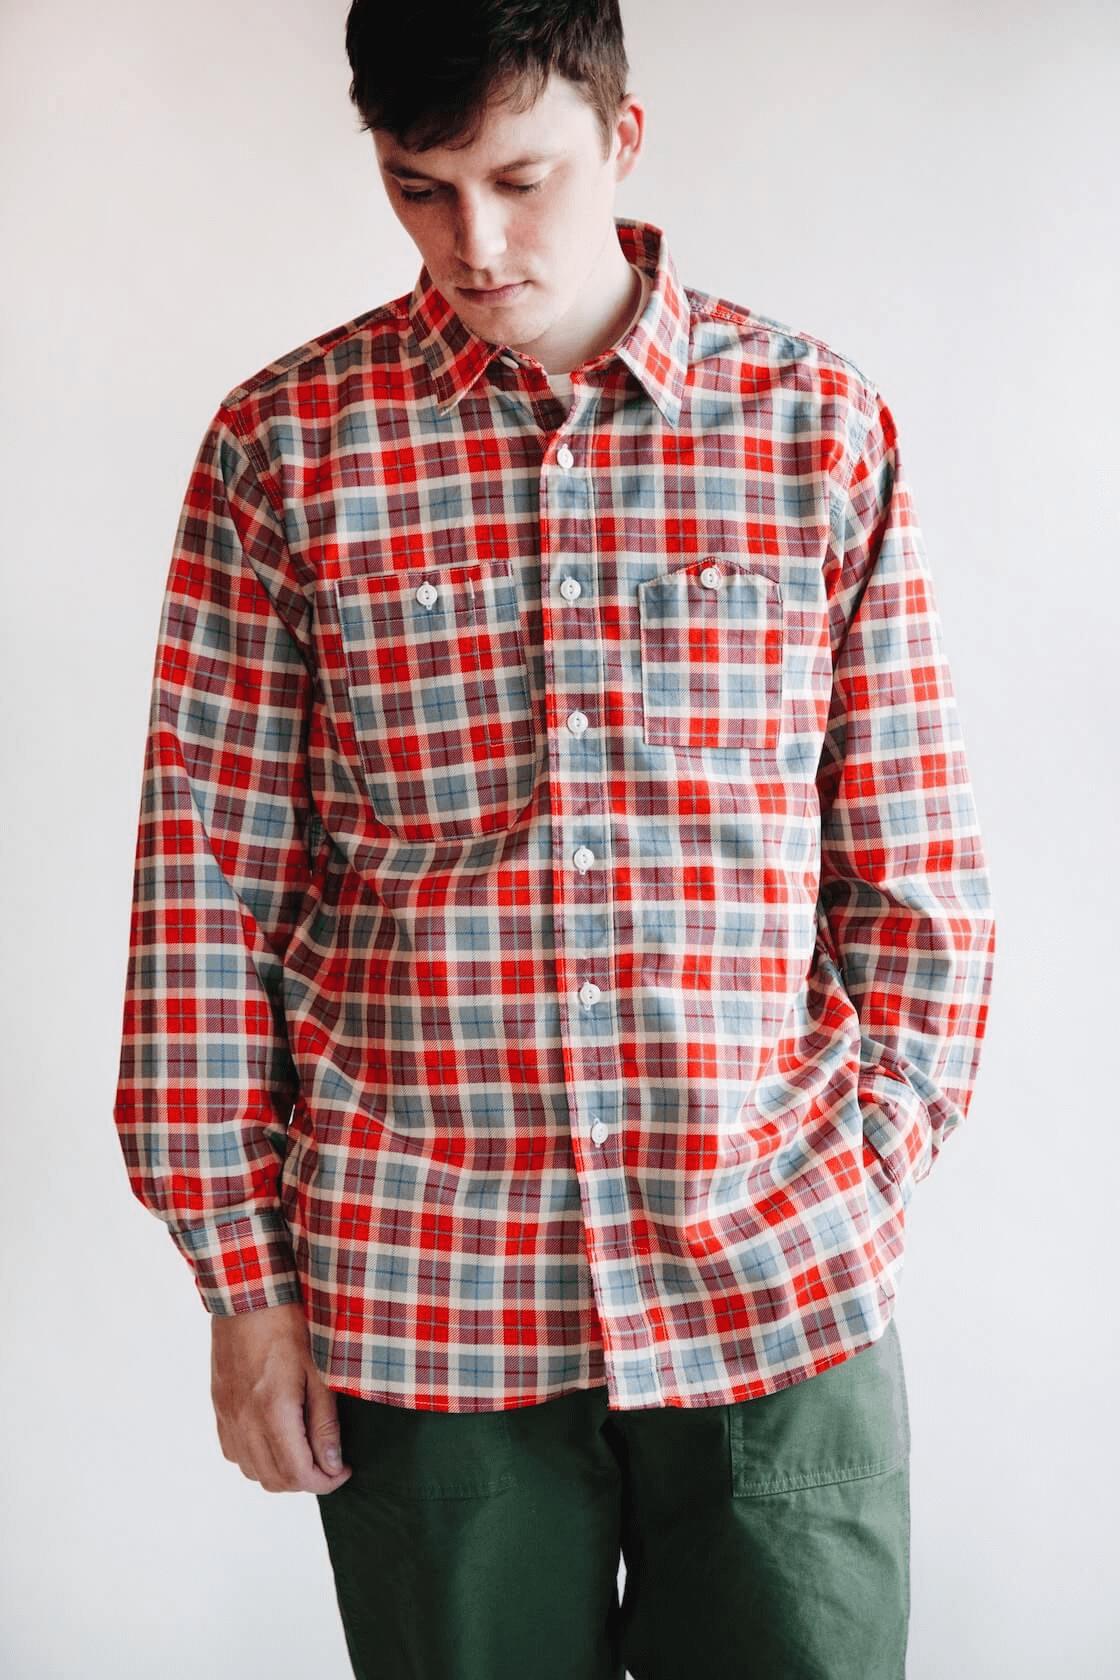 engineered garments work shirt on body